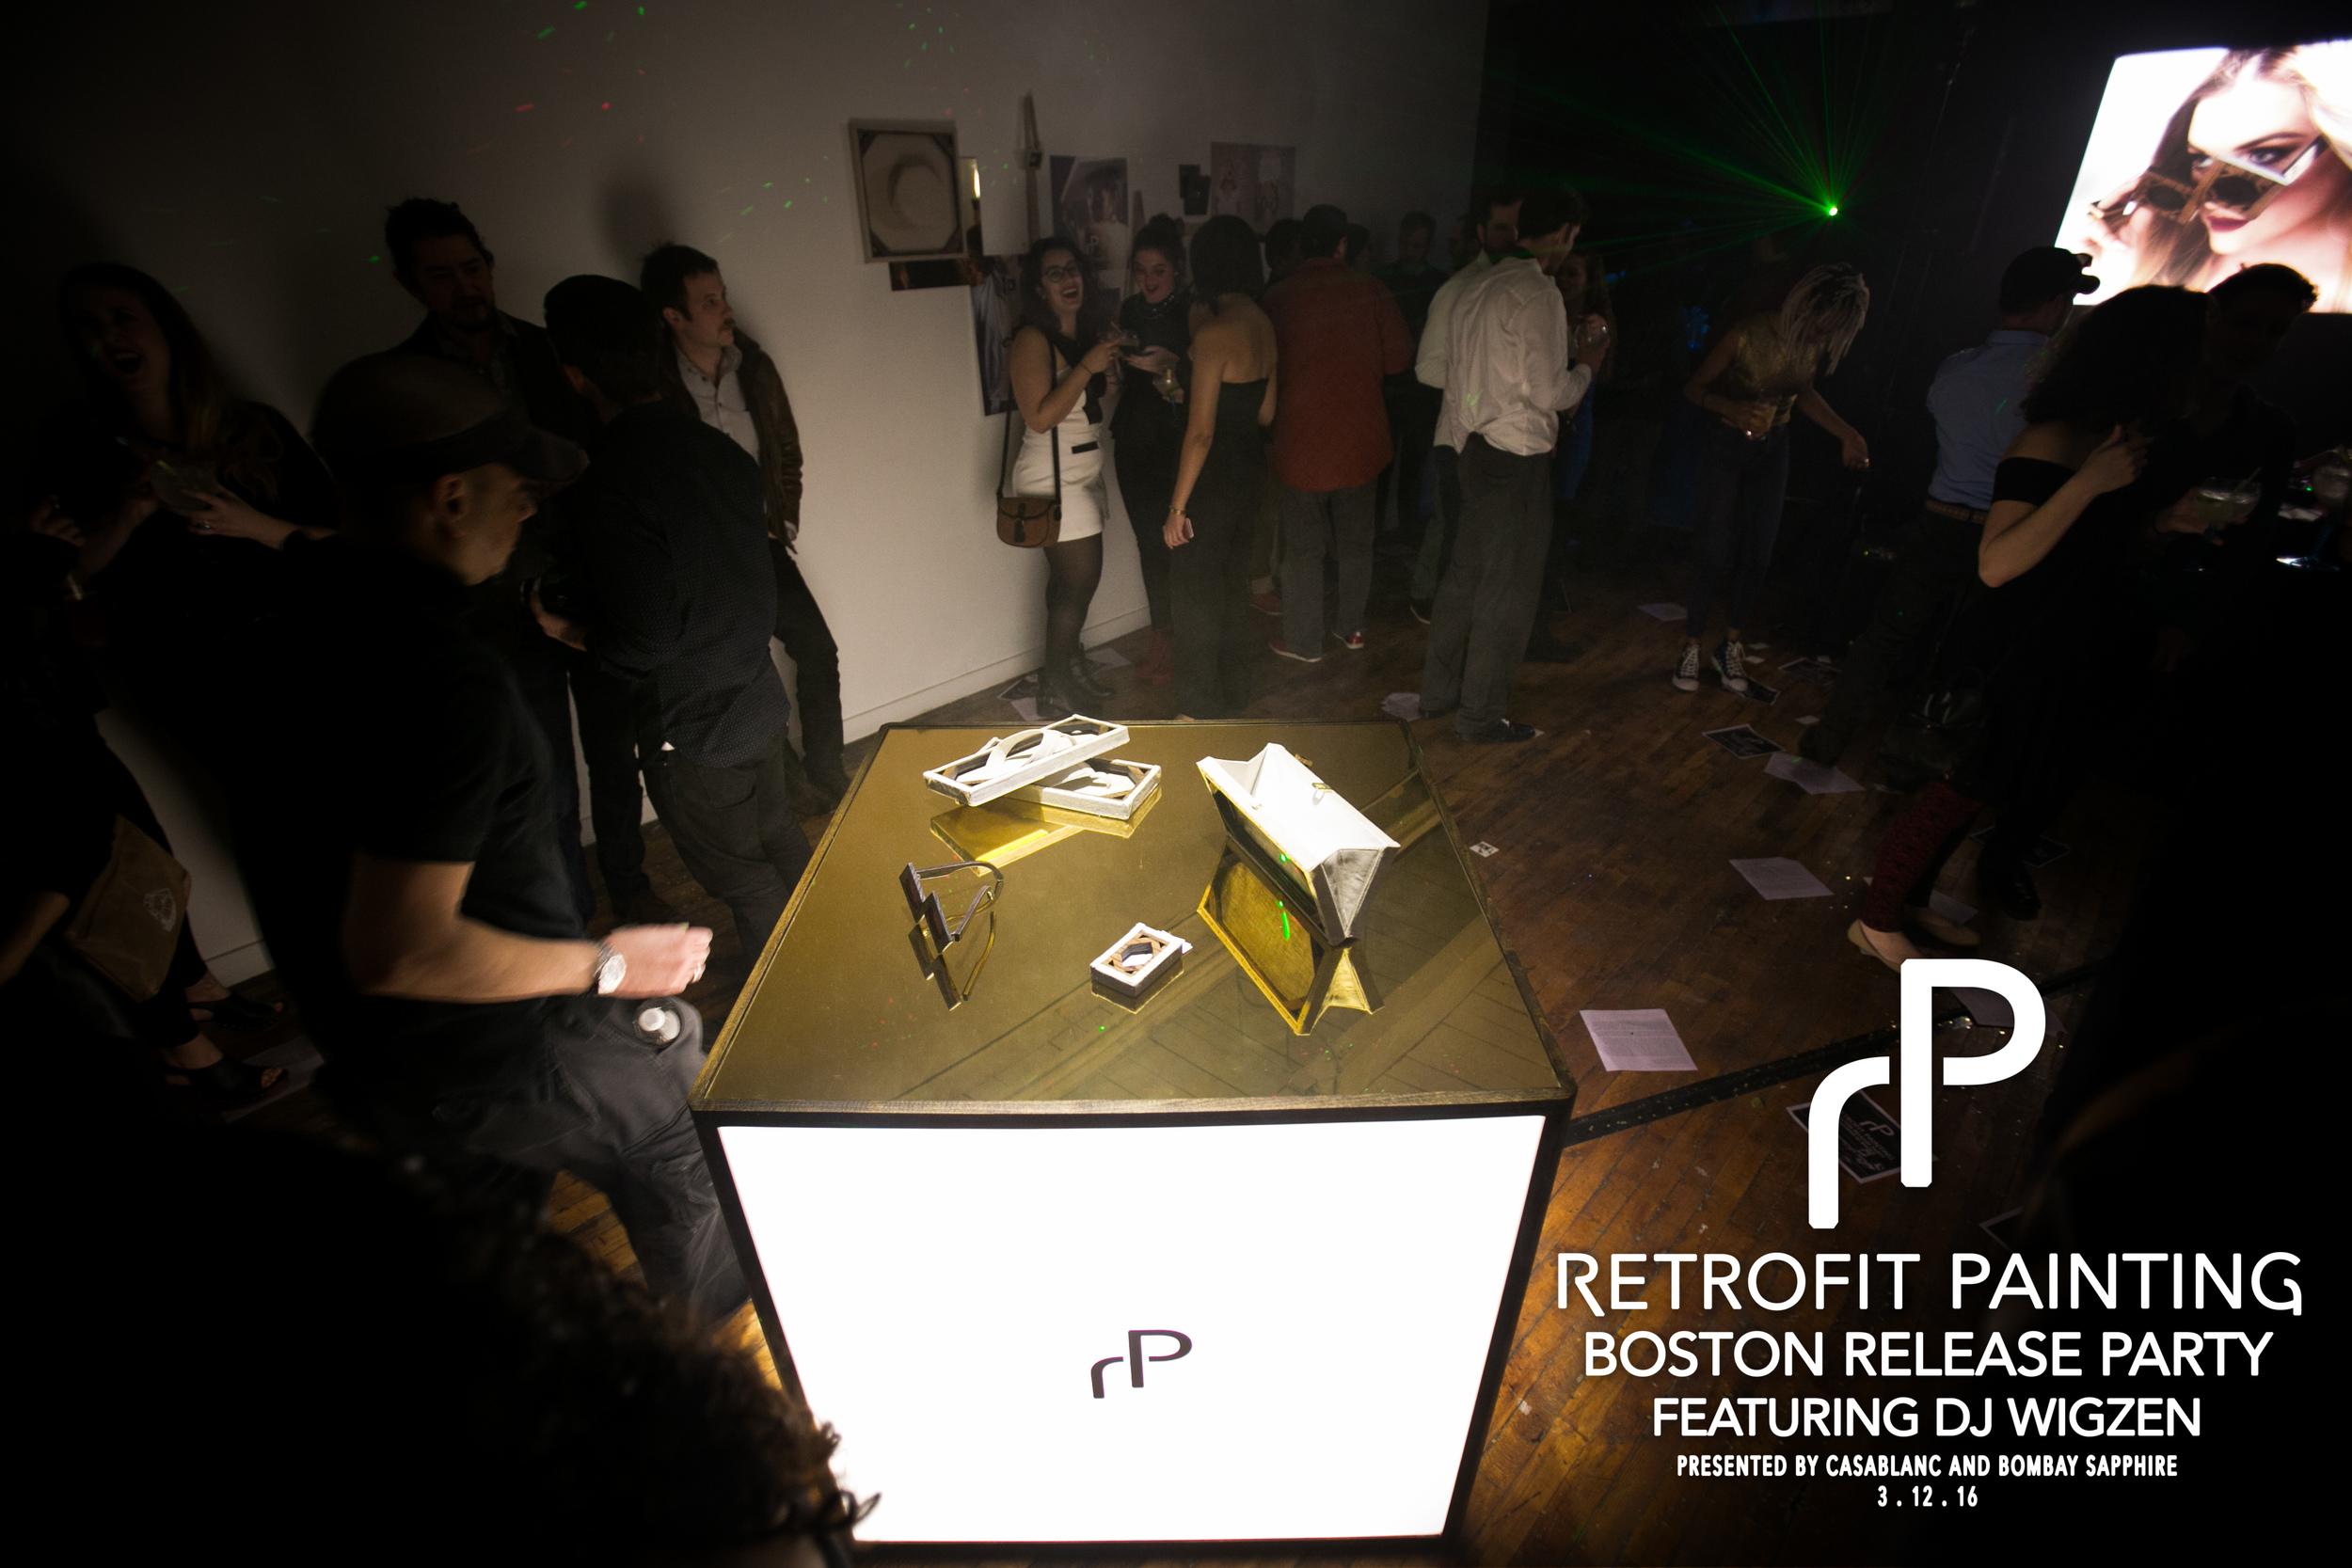 Retrofit Painting Boston Release Party 0206.jpg